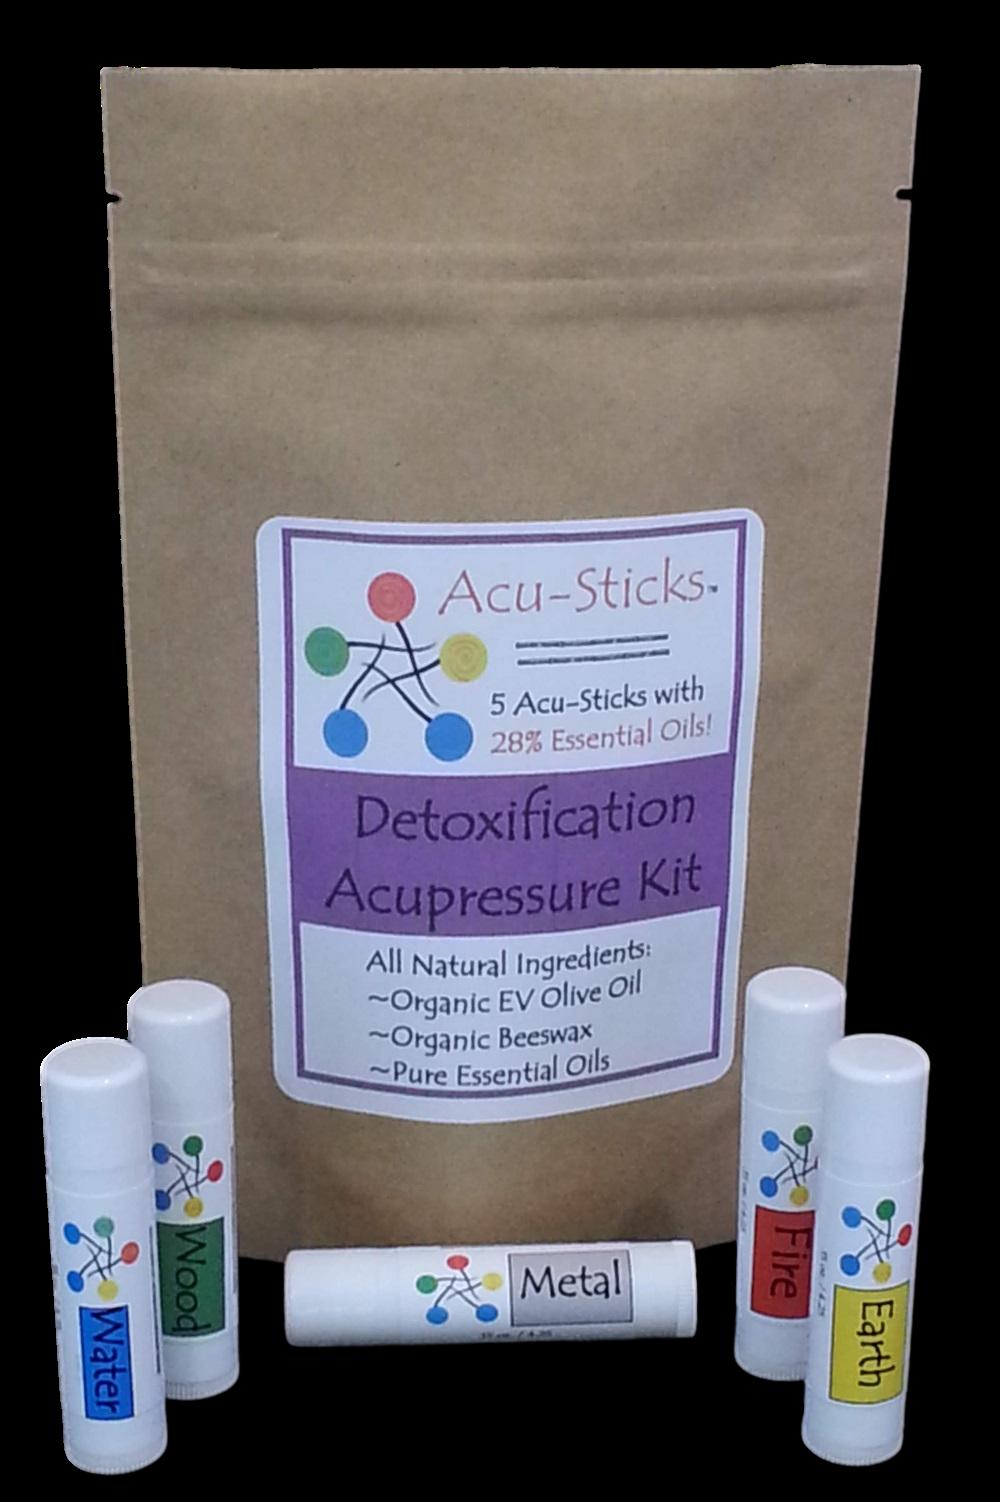 detoxification-kit-essential oils acupressure